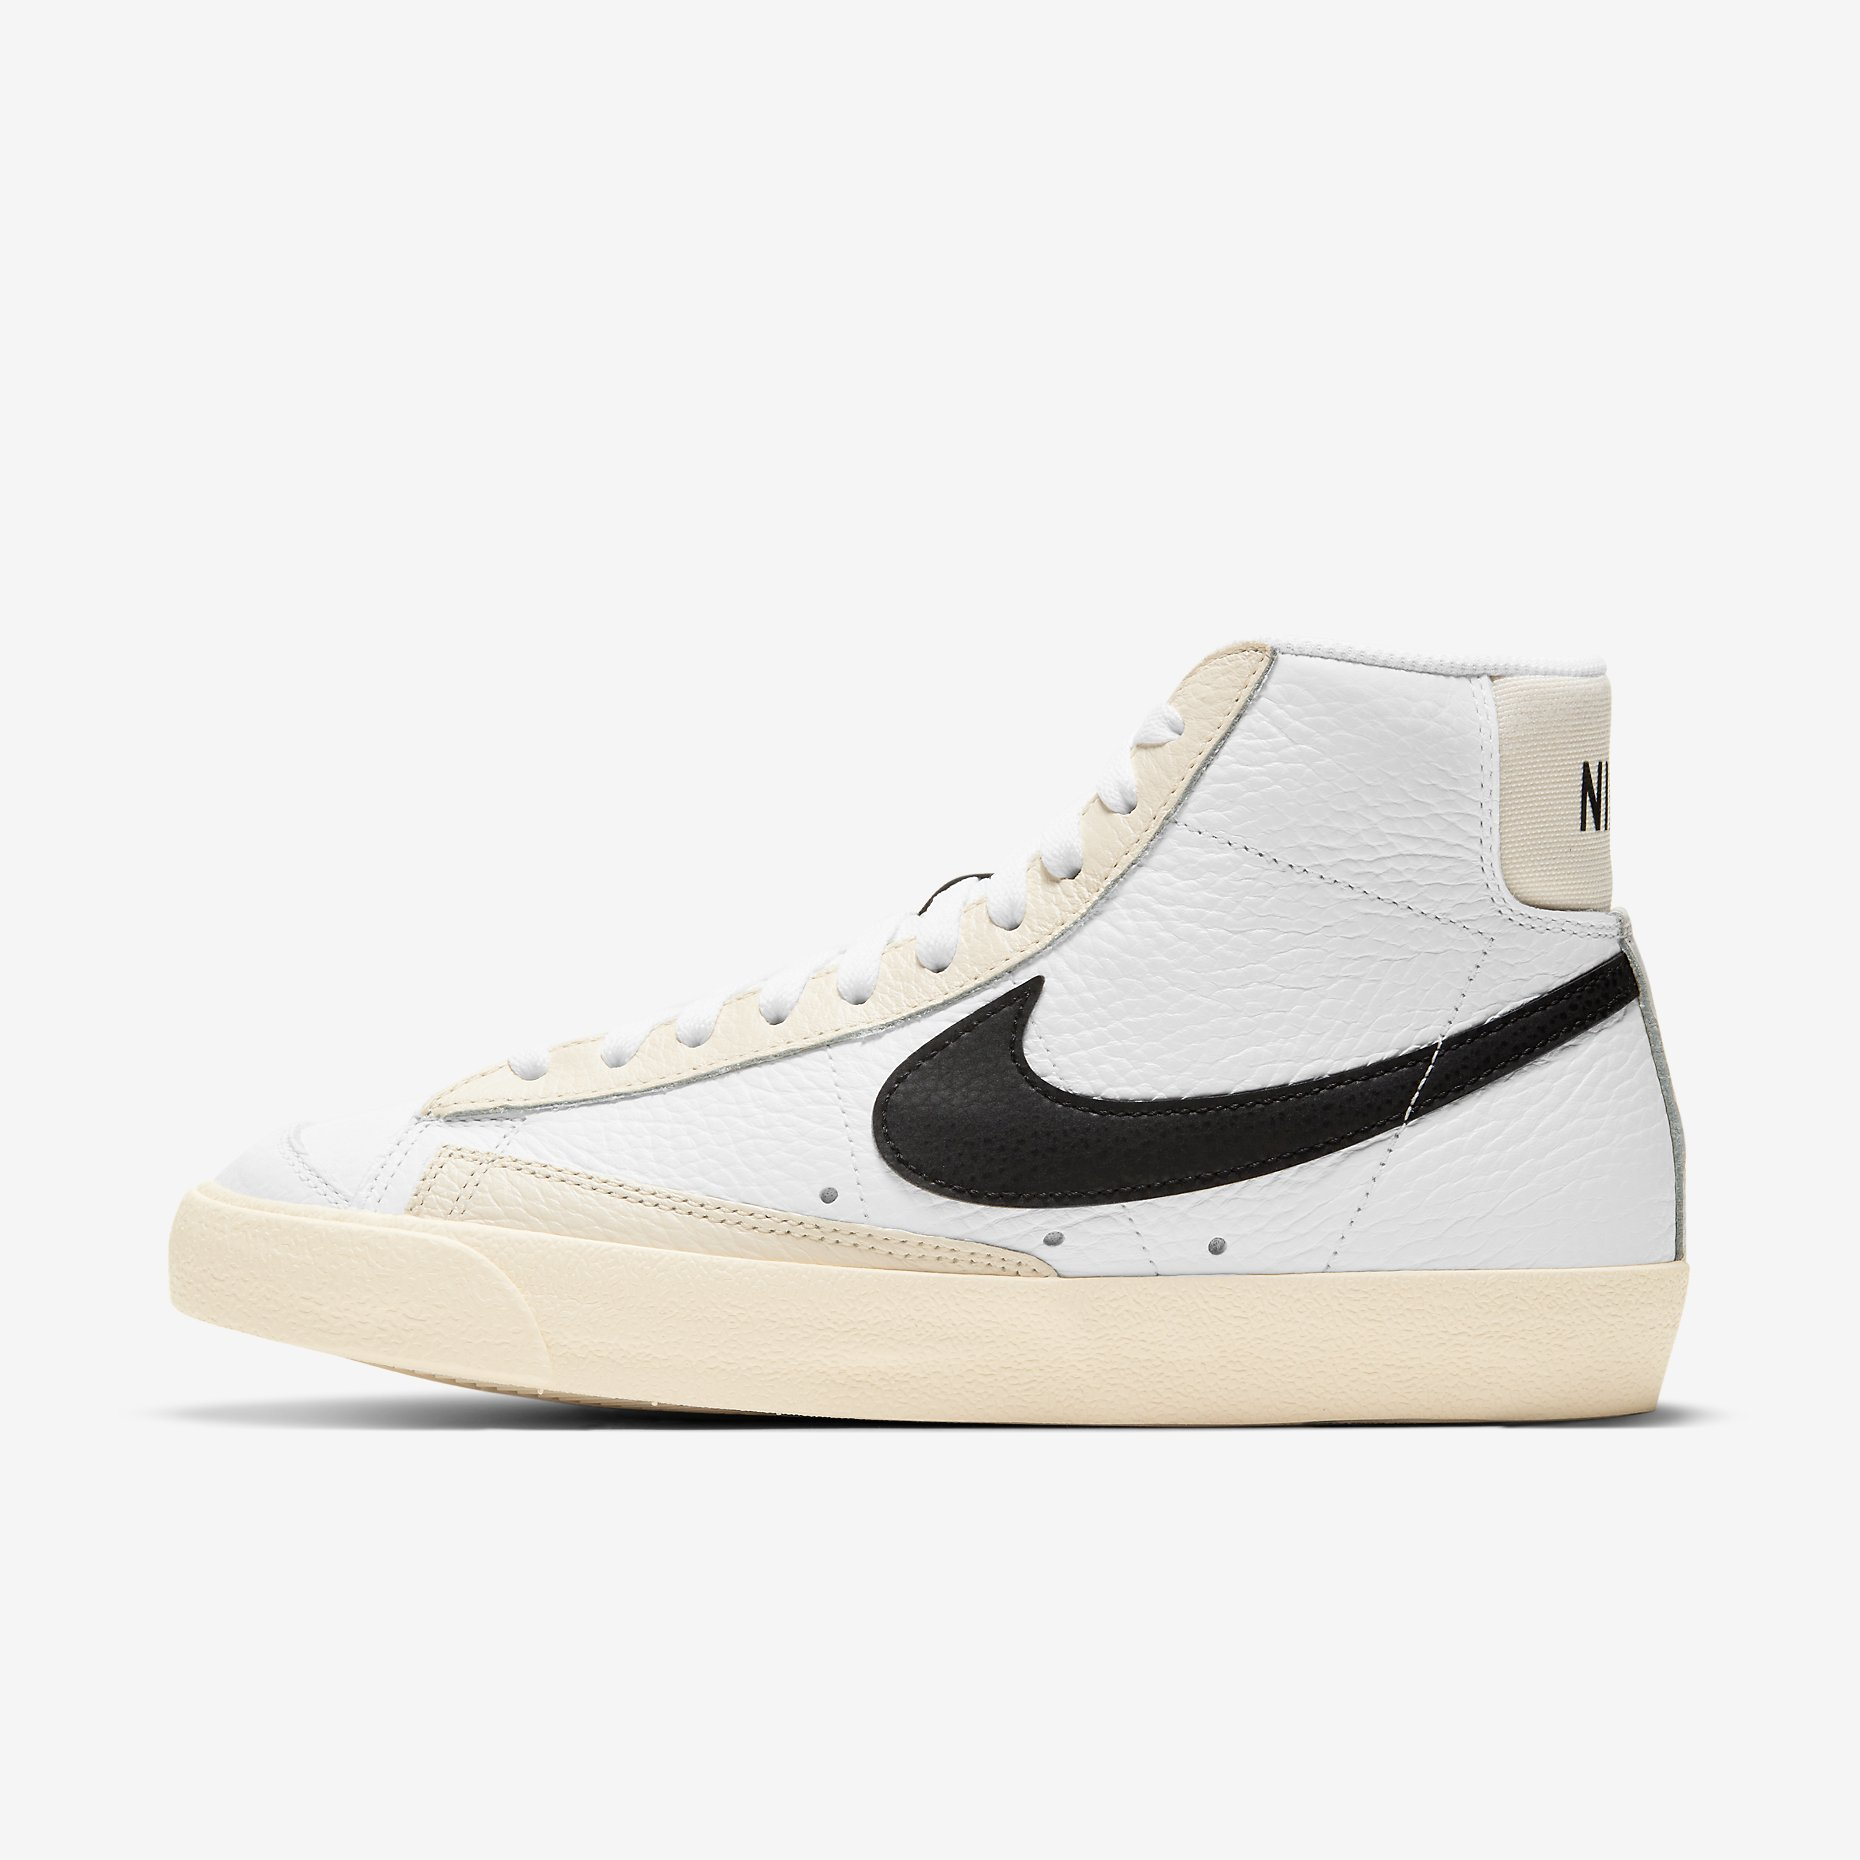 Women's Nike Blazer Mid '77 'Pale Ivory' - Bar Code